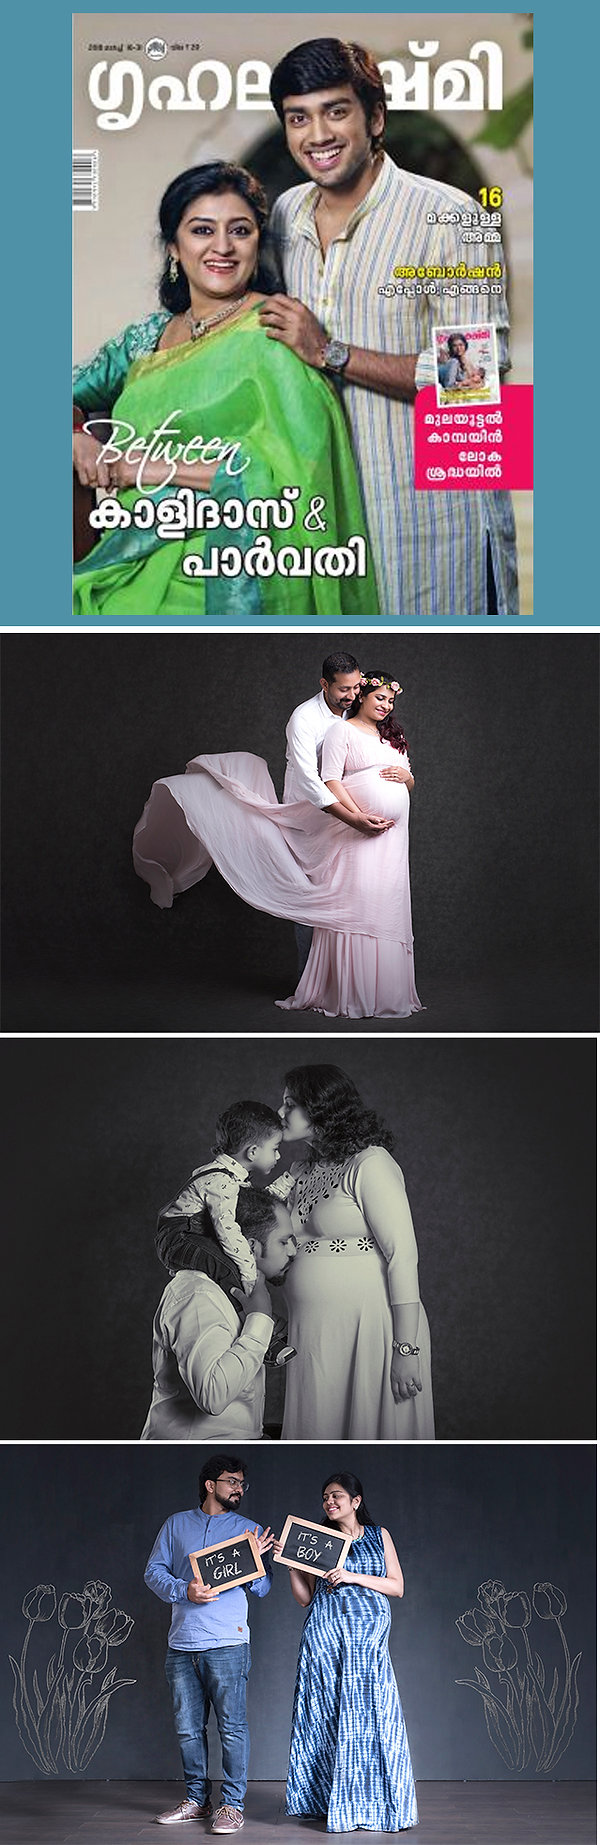 Maternity photographer; bliss photoart